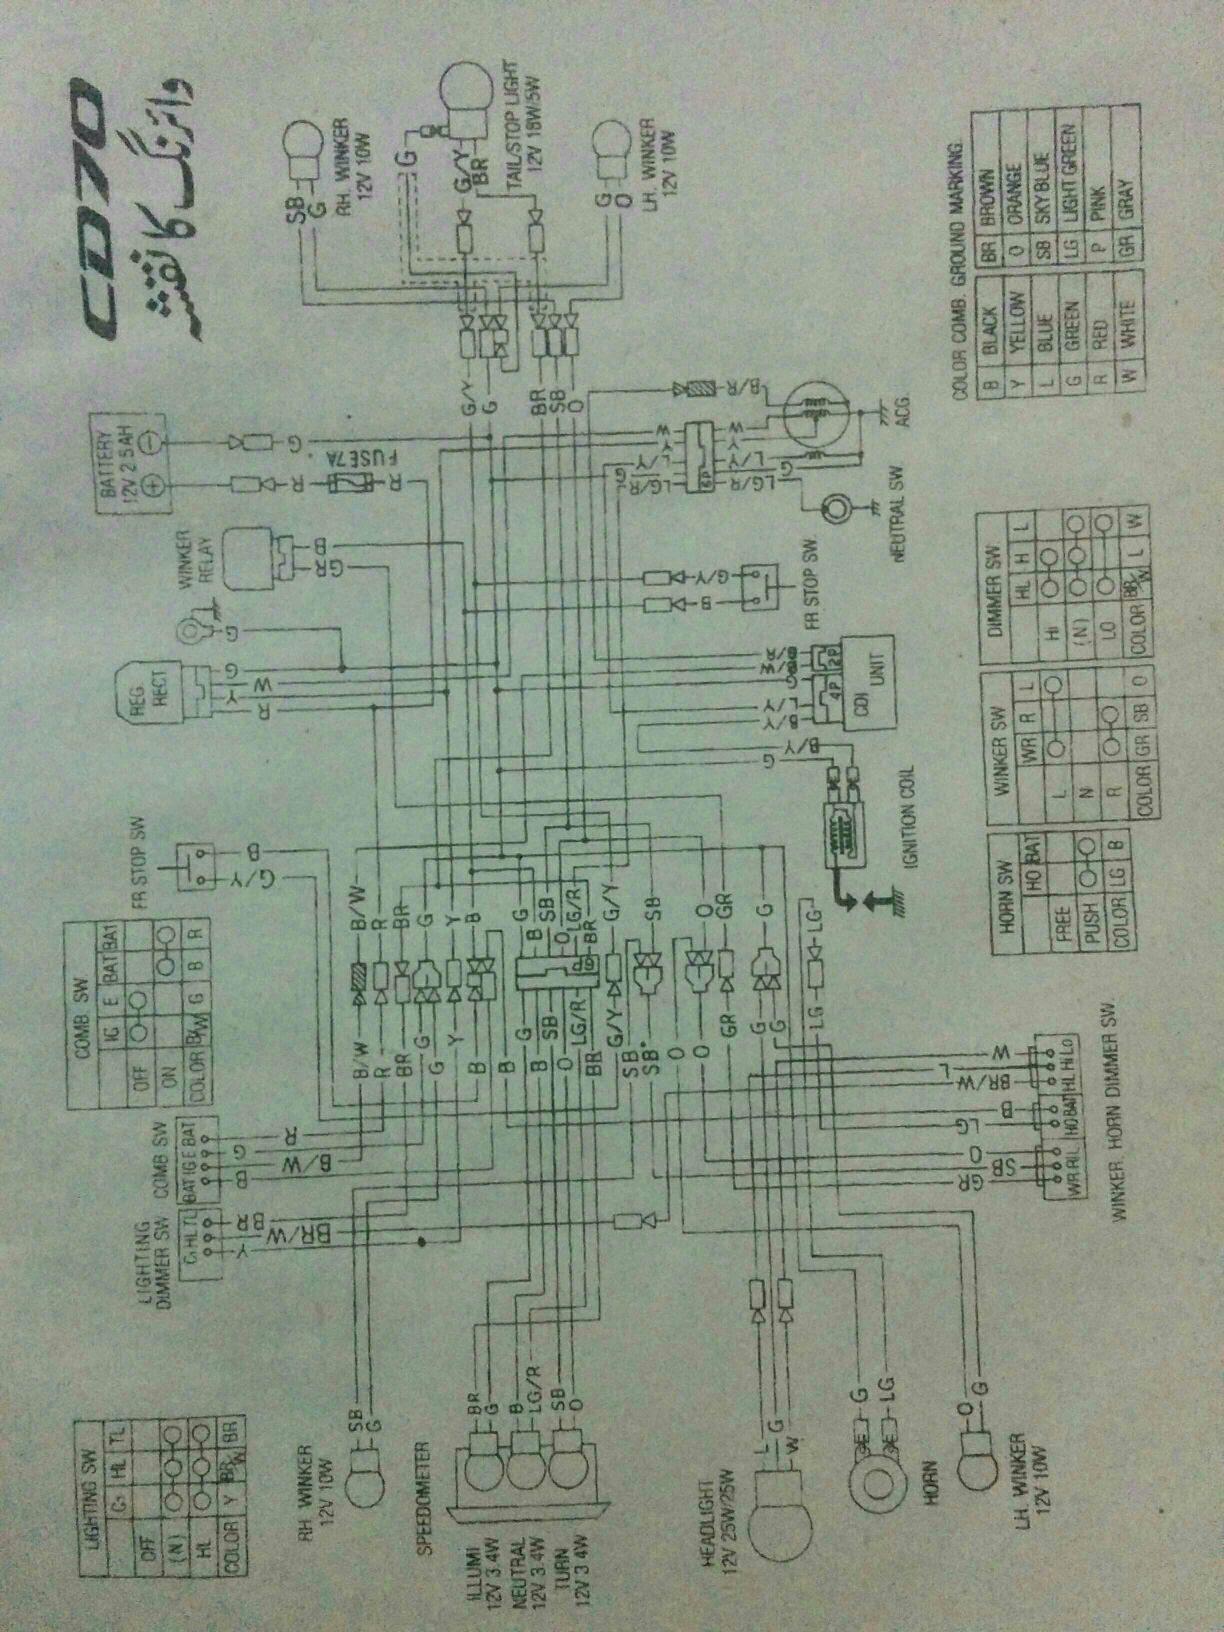 Honda Cd 70 Wiring Diagram Pdf - Bike's Collection and InfoBike's Collection and Info